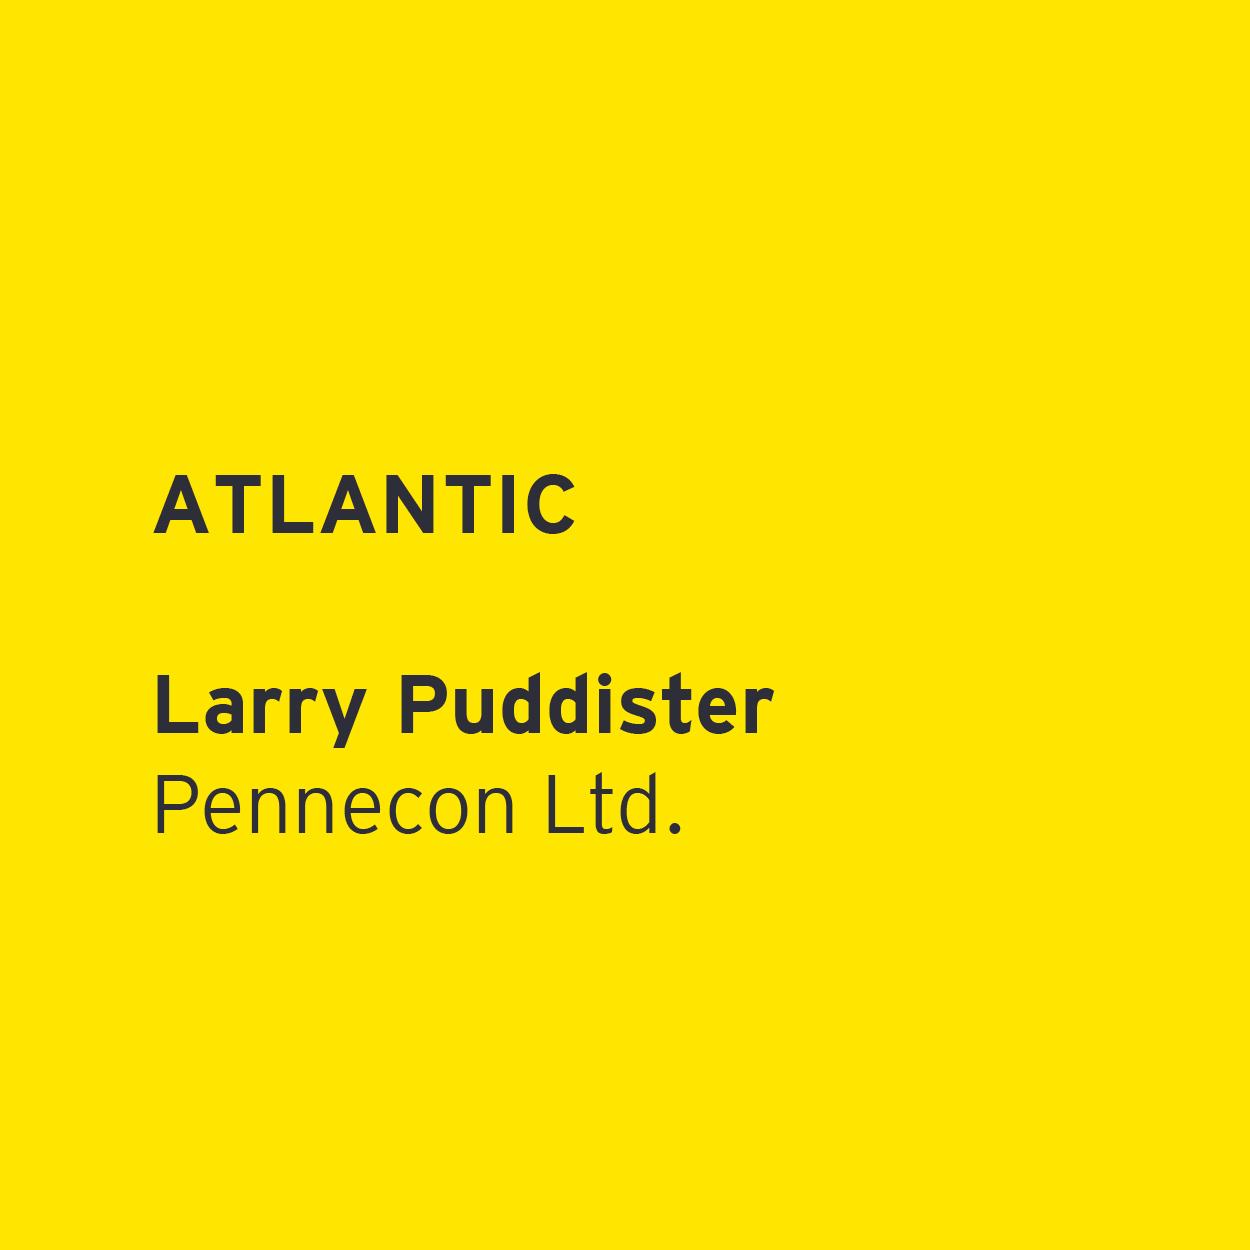 Larry Puddister - Pennecon Ltd.